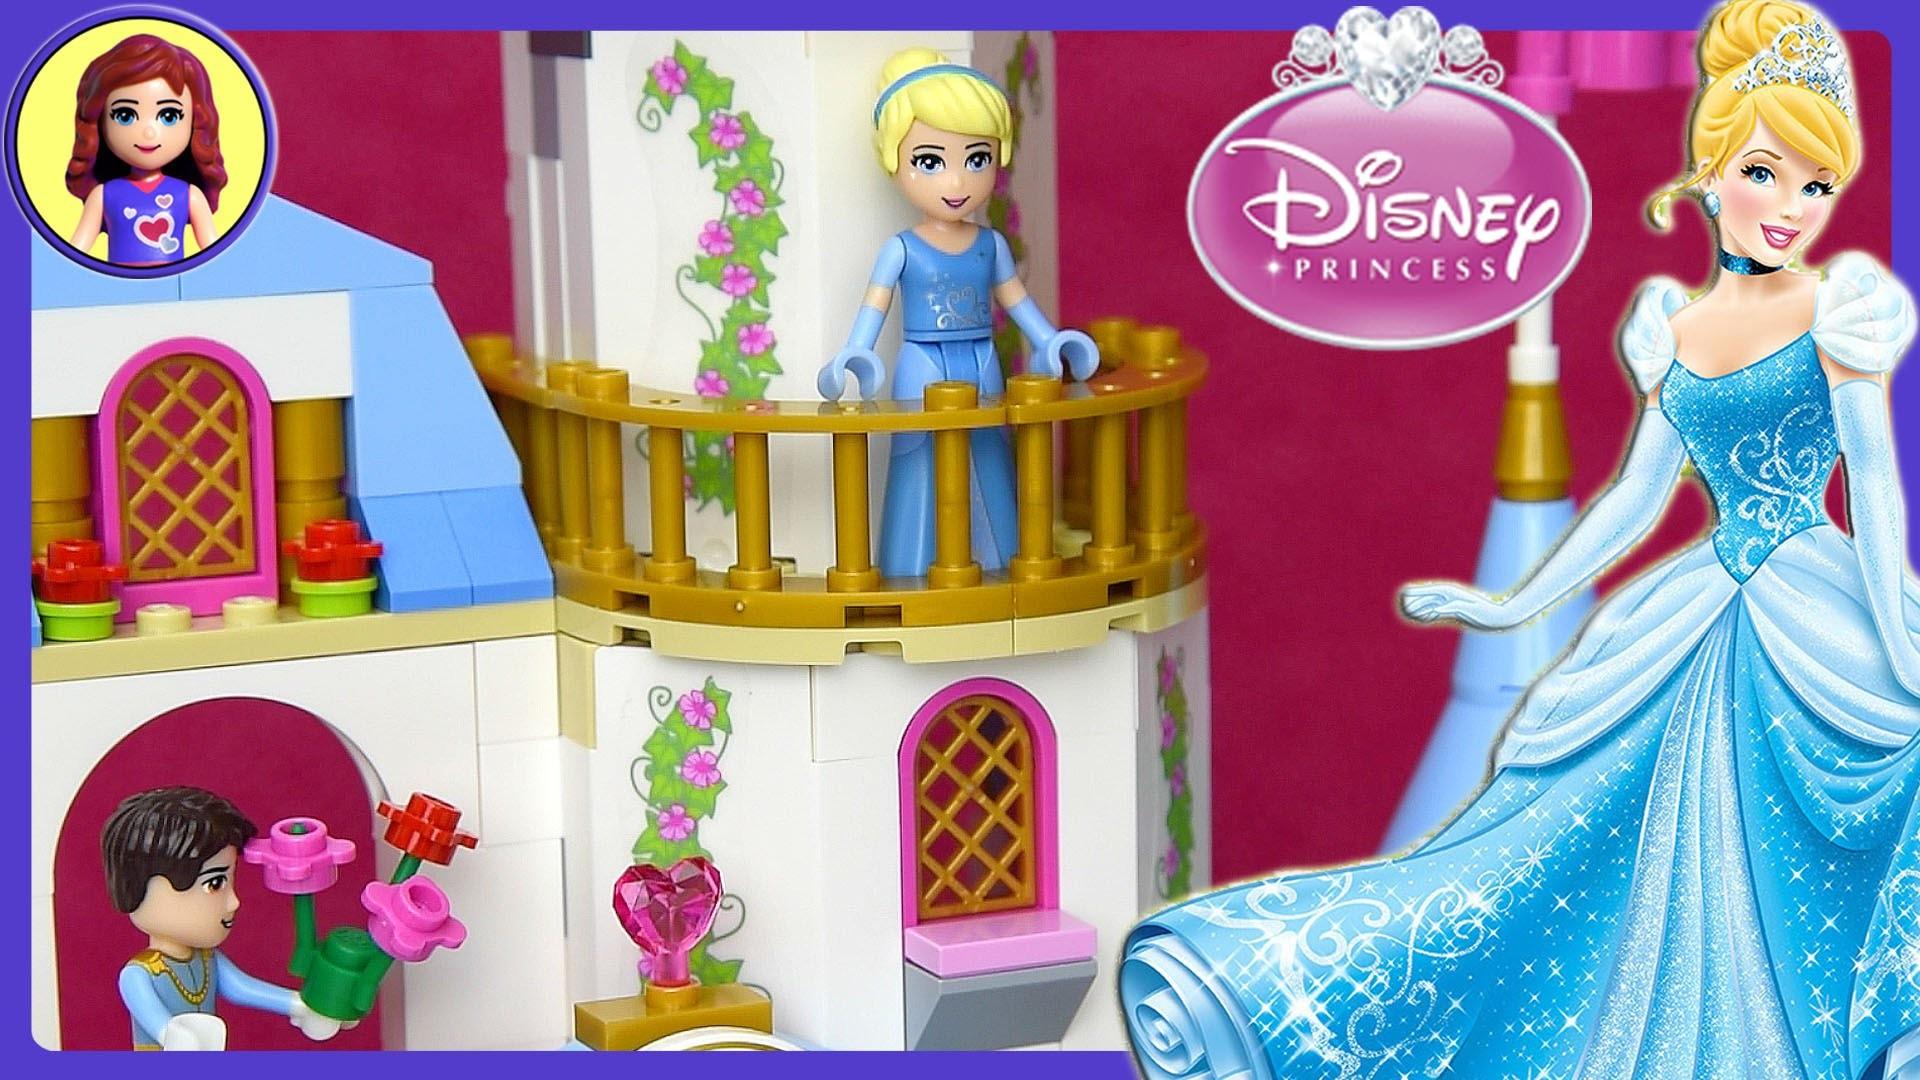 Cinderella's Romantic Castle LEGO Disney Build Review Play - Kids Toys